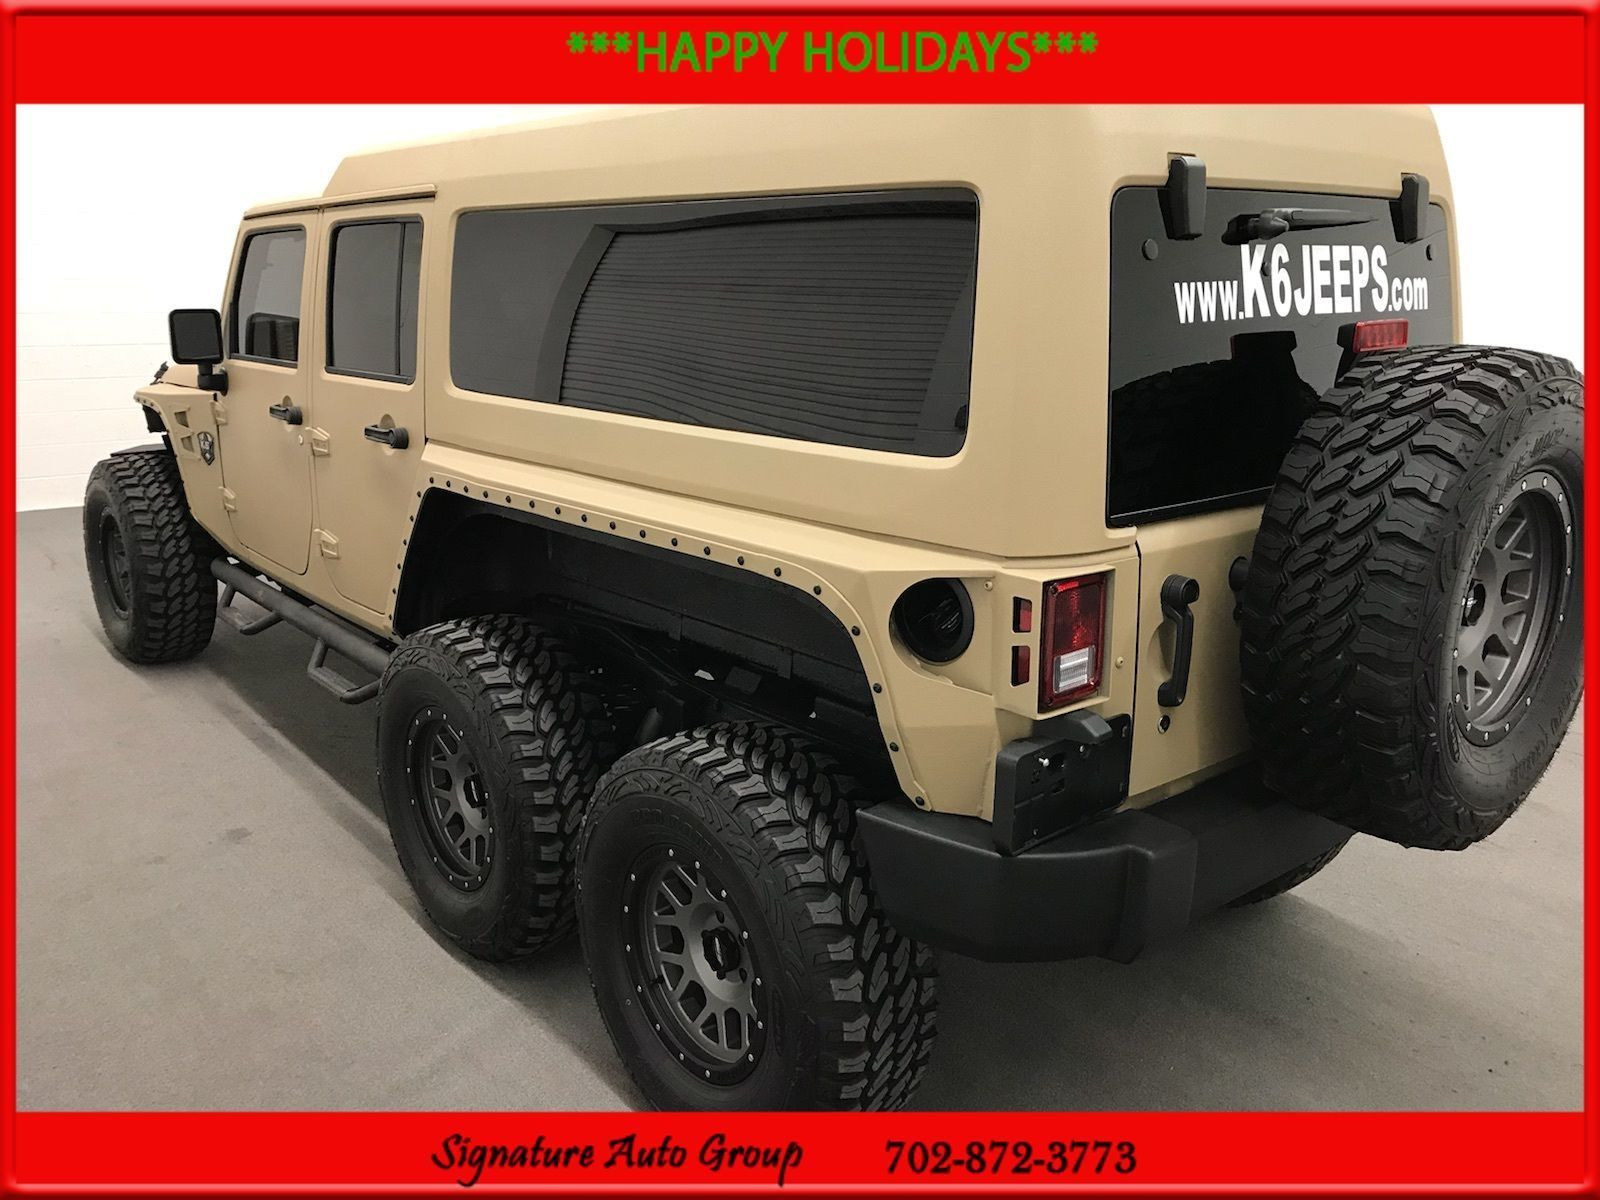 2016 Hyundai Elantra Value Edition >> Used 2017 Jeep Wrangler 6×6 Jeep 6 Wheel Drive! Used – Rare TVs Kev 2018-2019   24CarShop.com